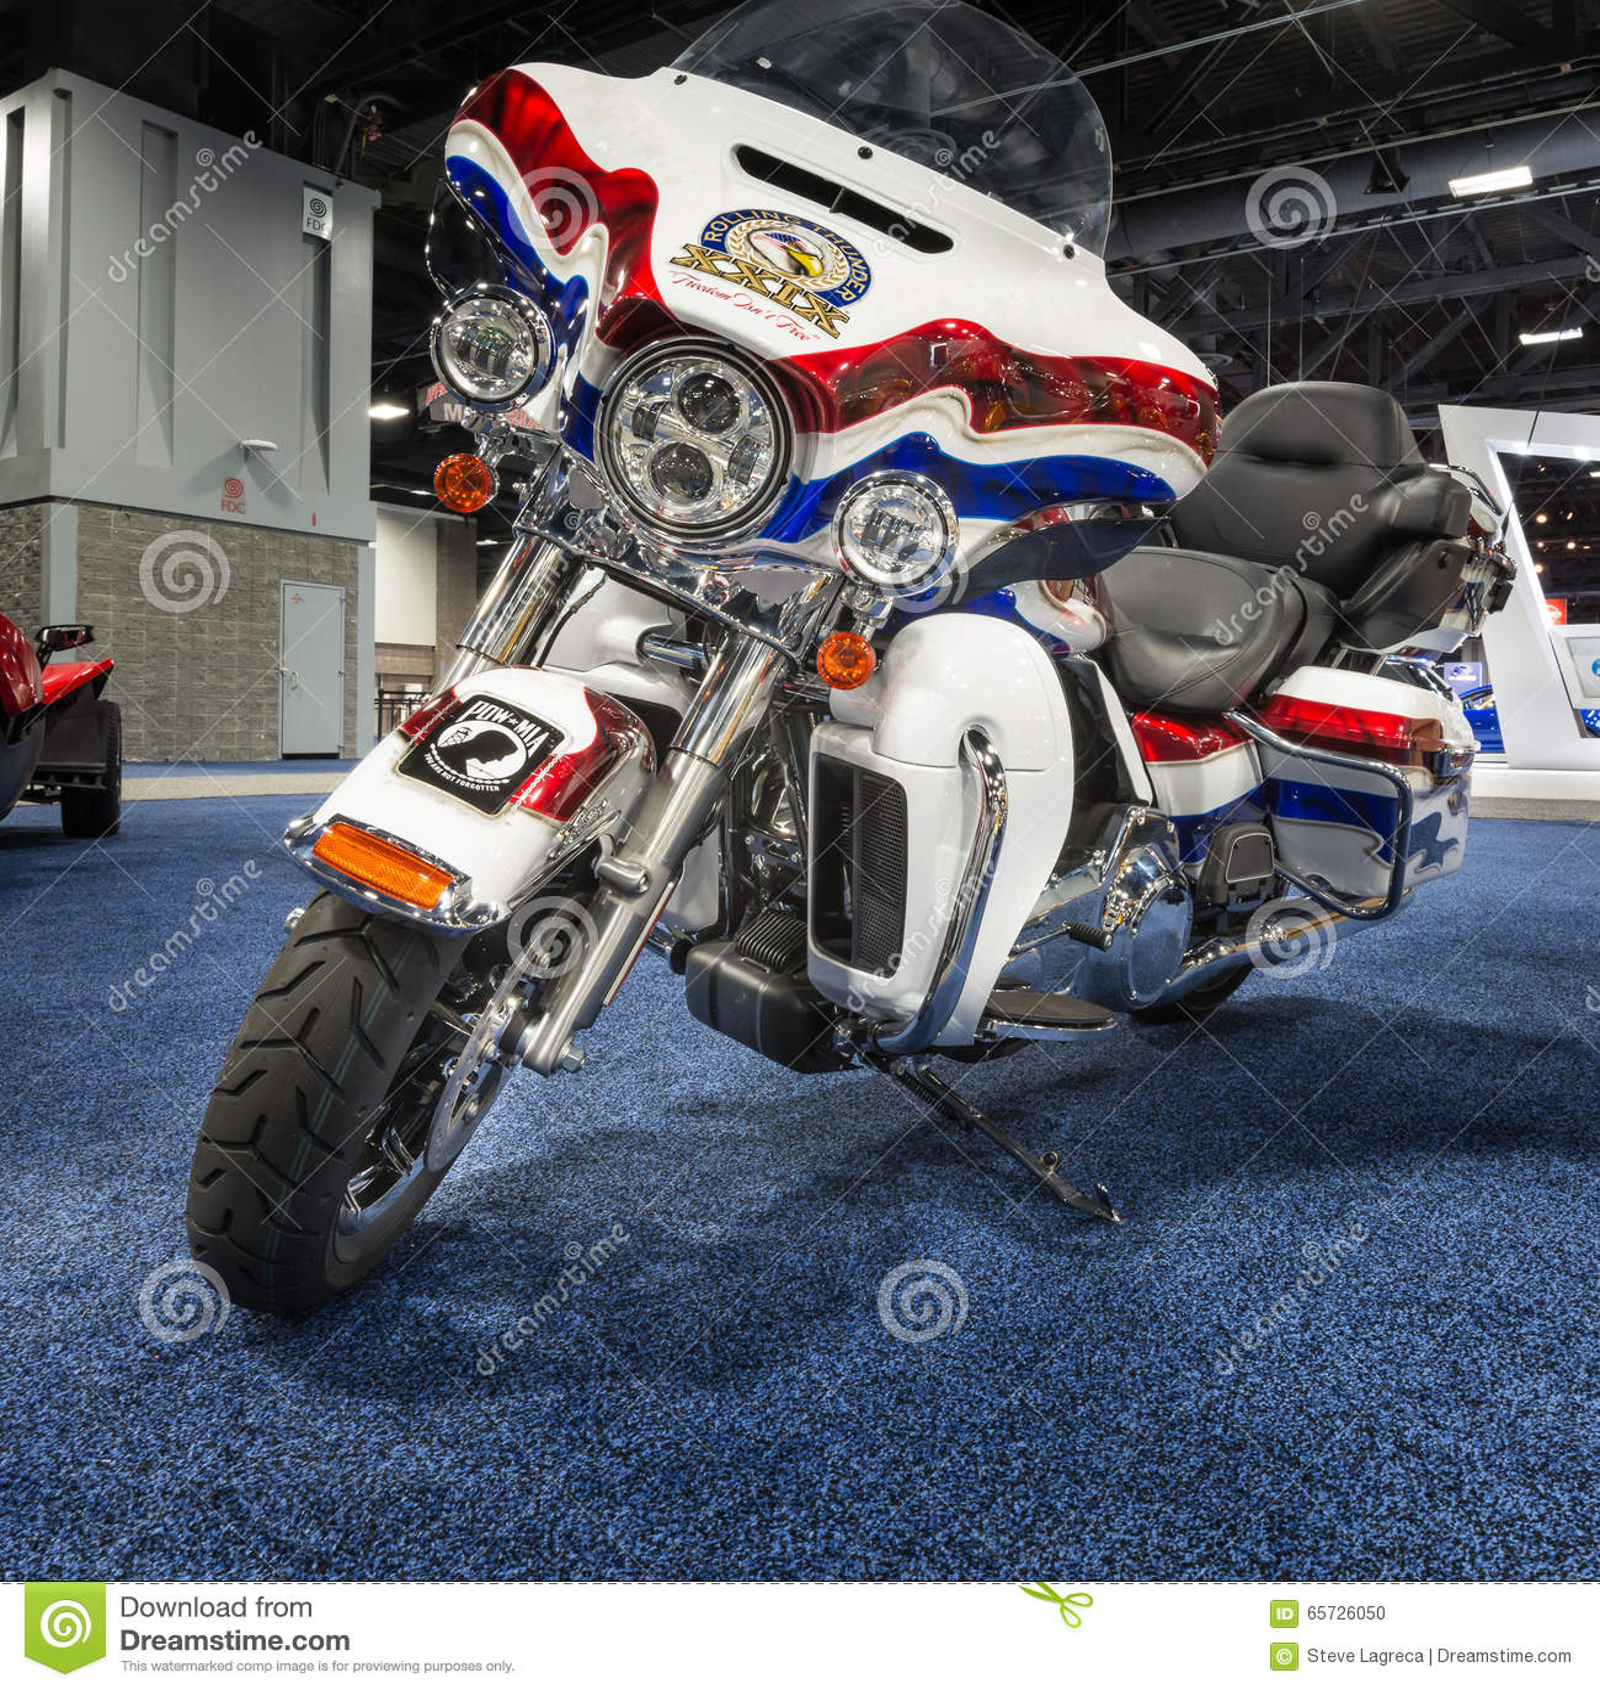 Auto Davidson Electra Freedom Glide Harley